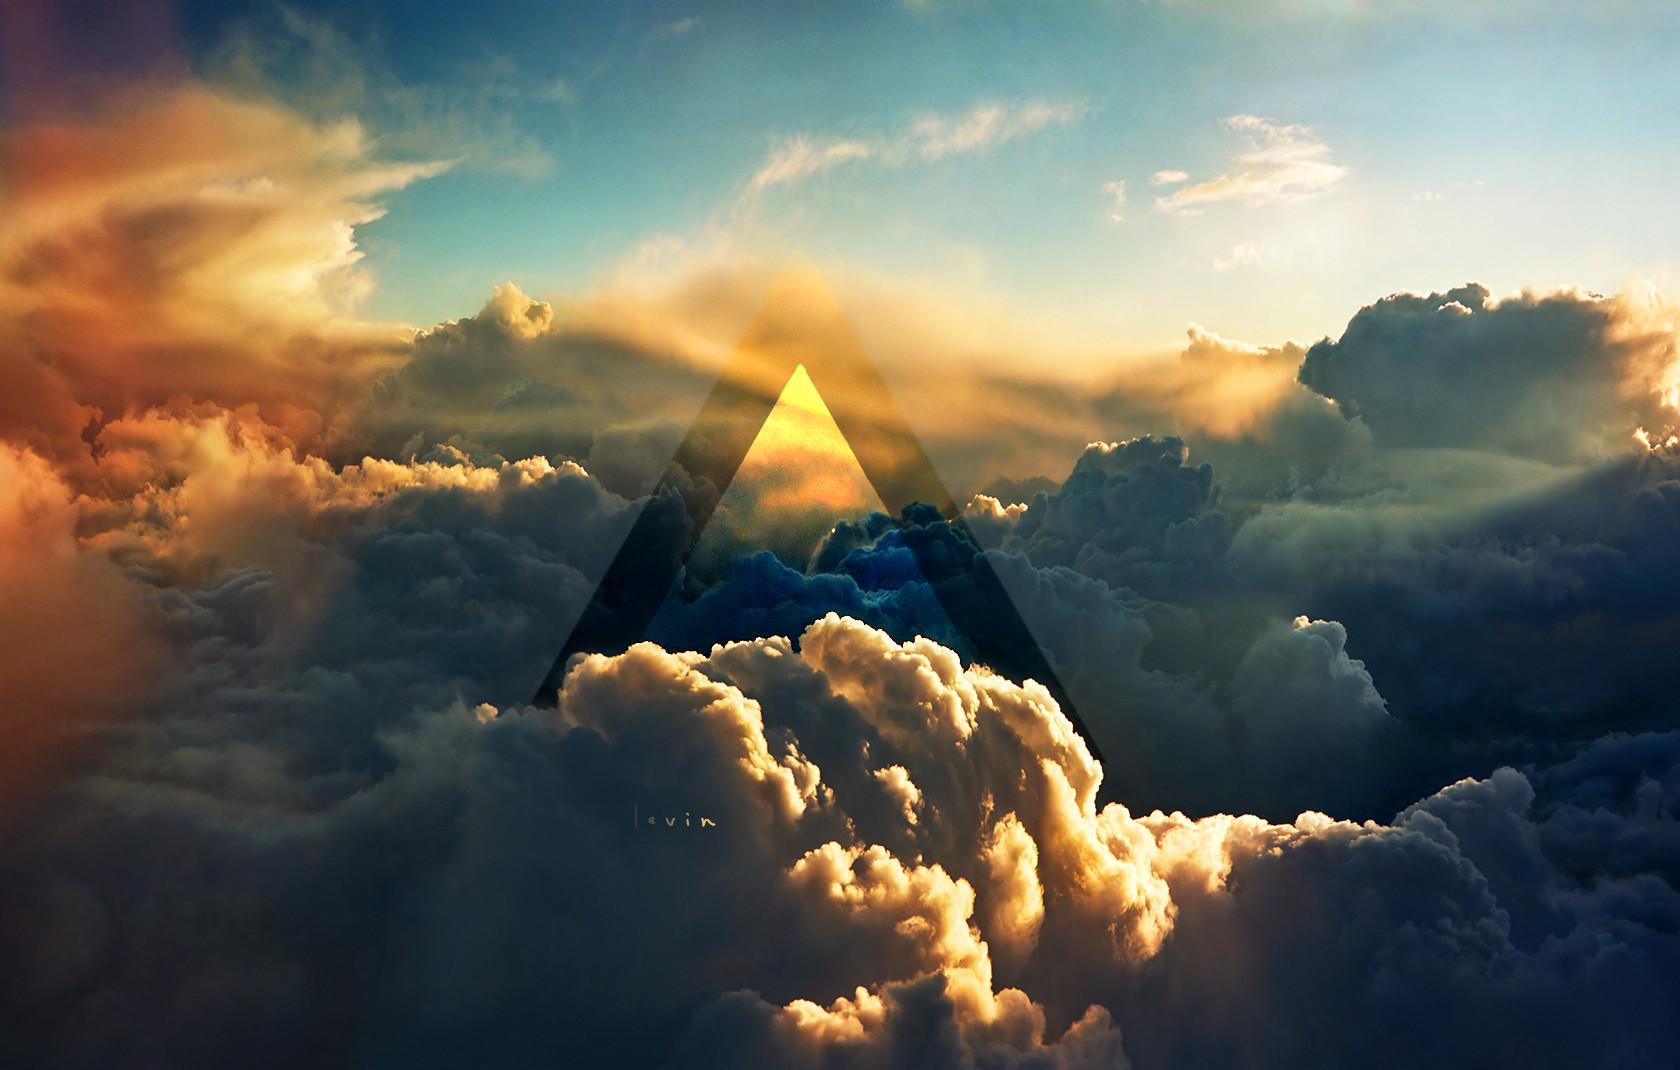 Hd wallpaper hipster - Hipster Triangle Wallpaper Cloud Hd Background Wallpaper